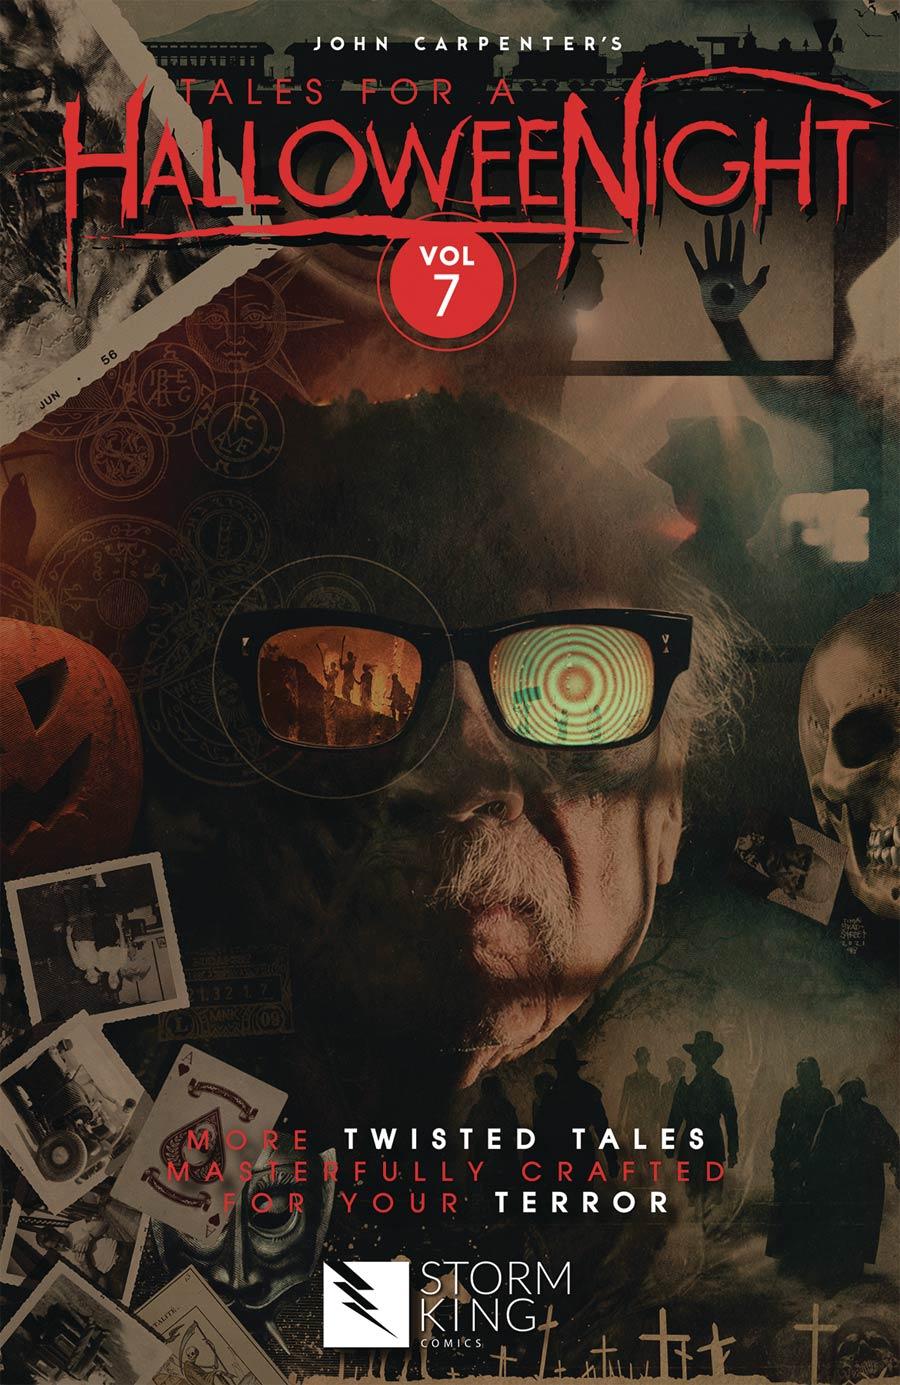 John Carpenters Tales For A Halloween Night Vol 7 GN